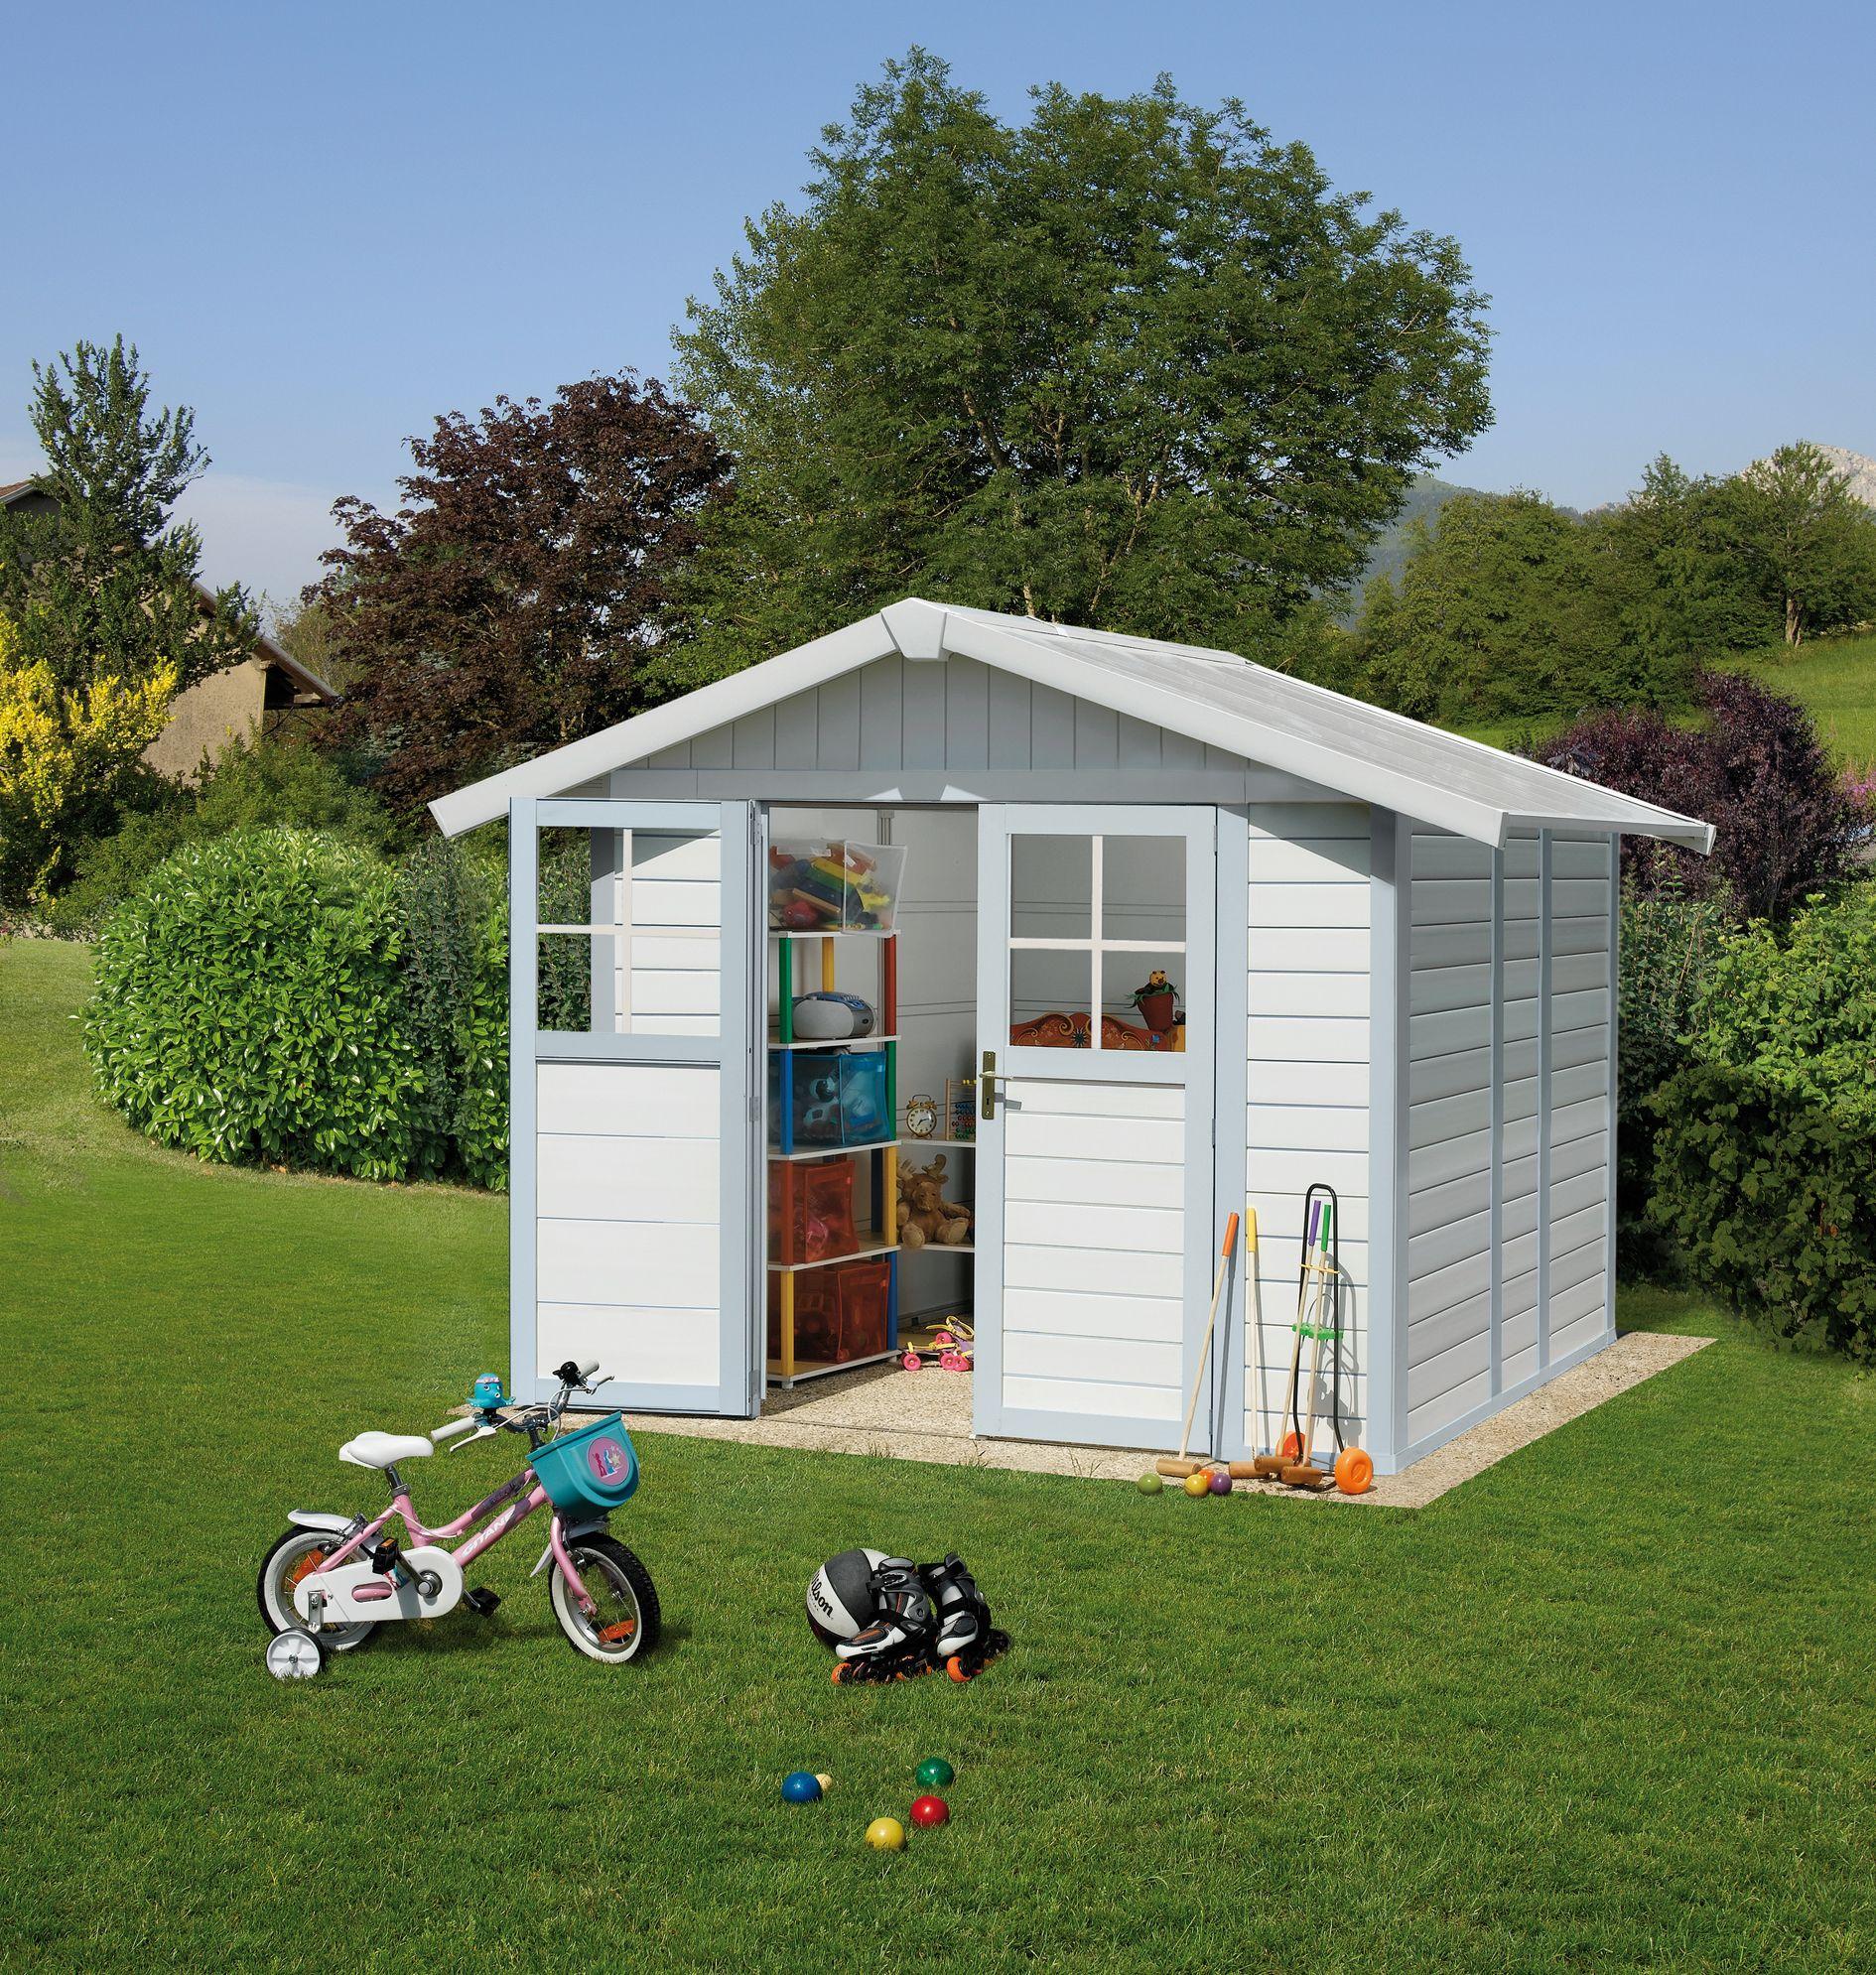 Abri de jardin Grosfillex déco 7.5m² gris/bleu | Abri de jardin ...